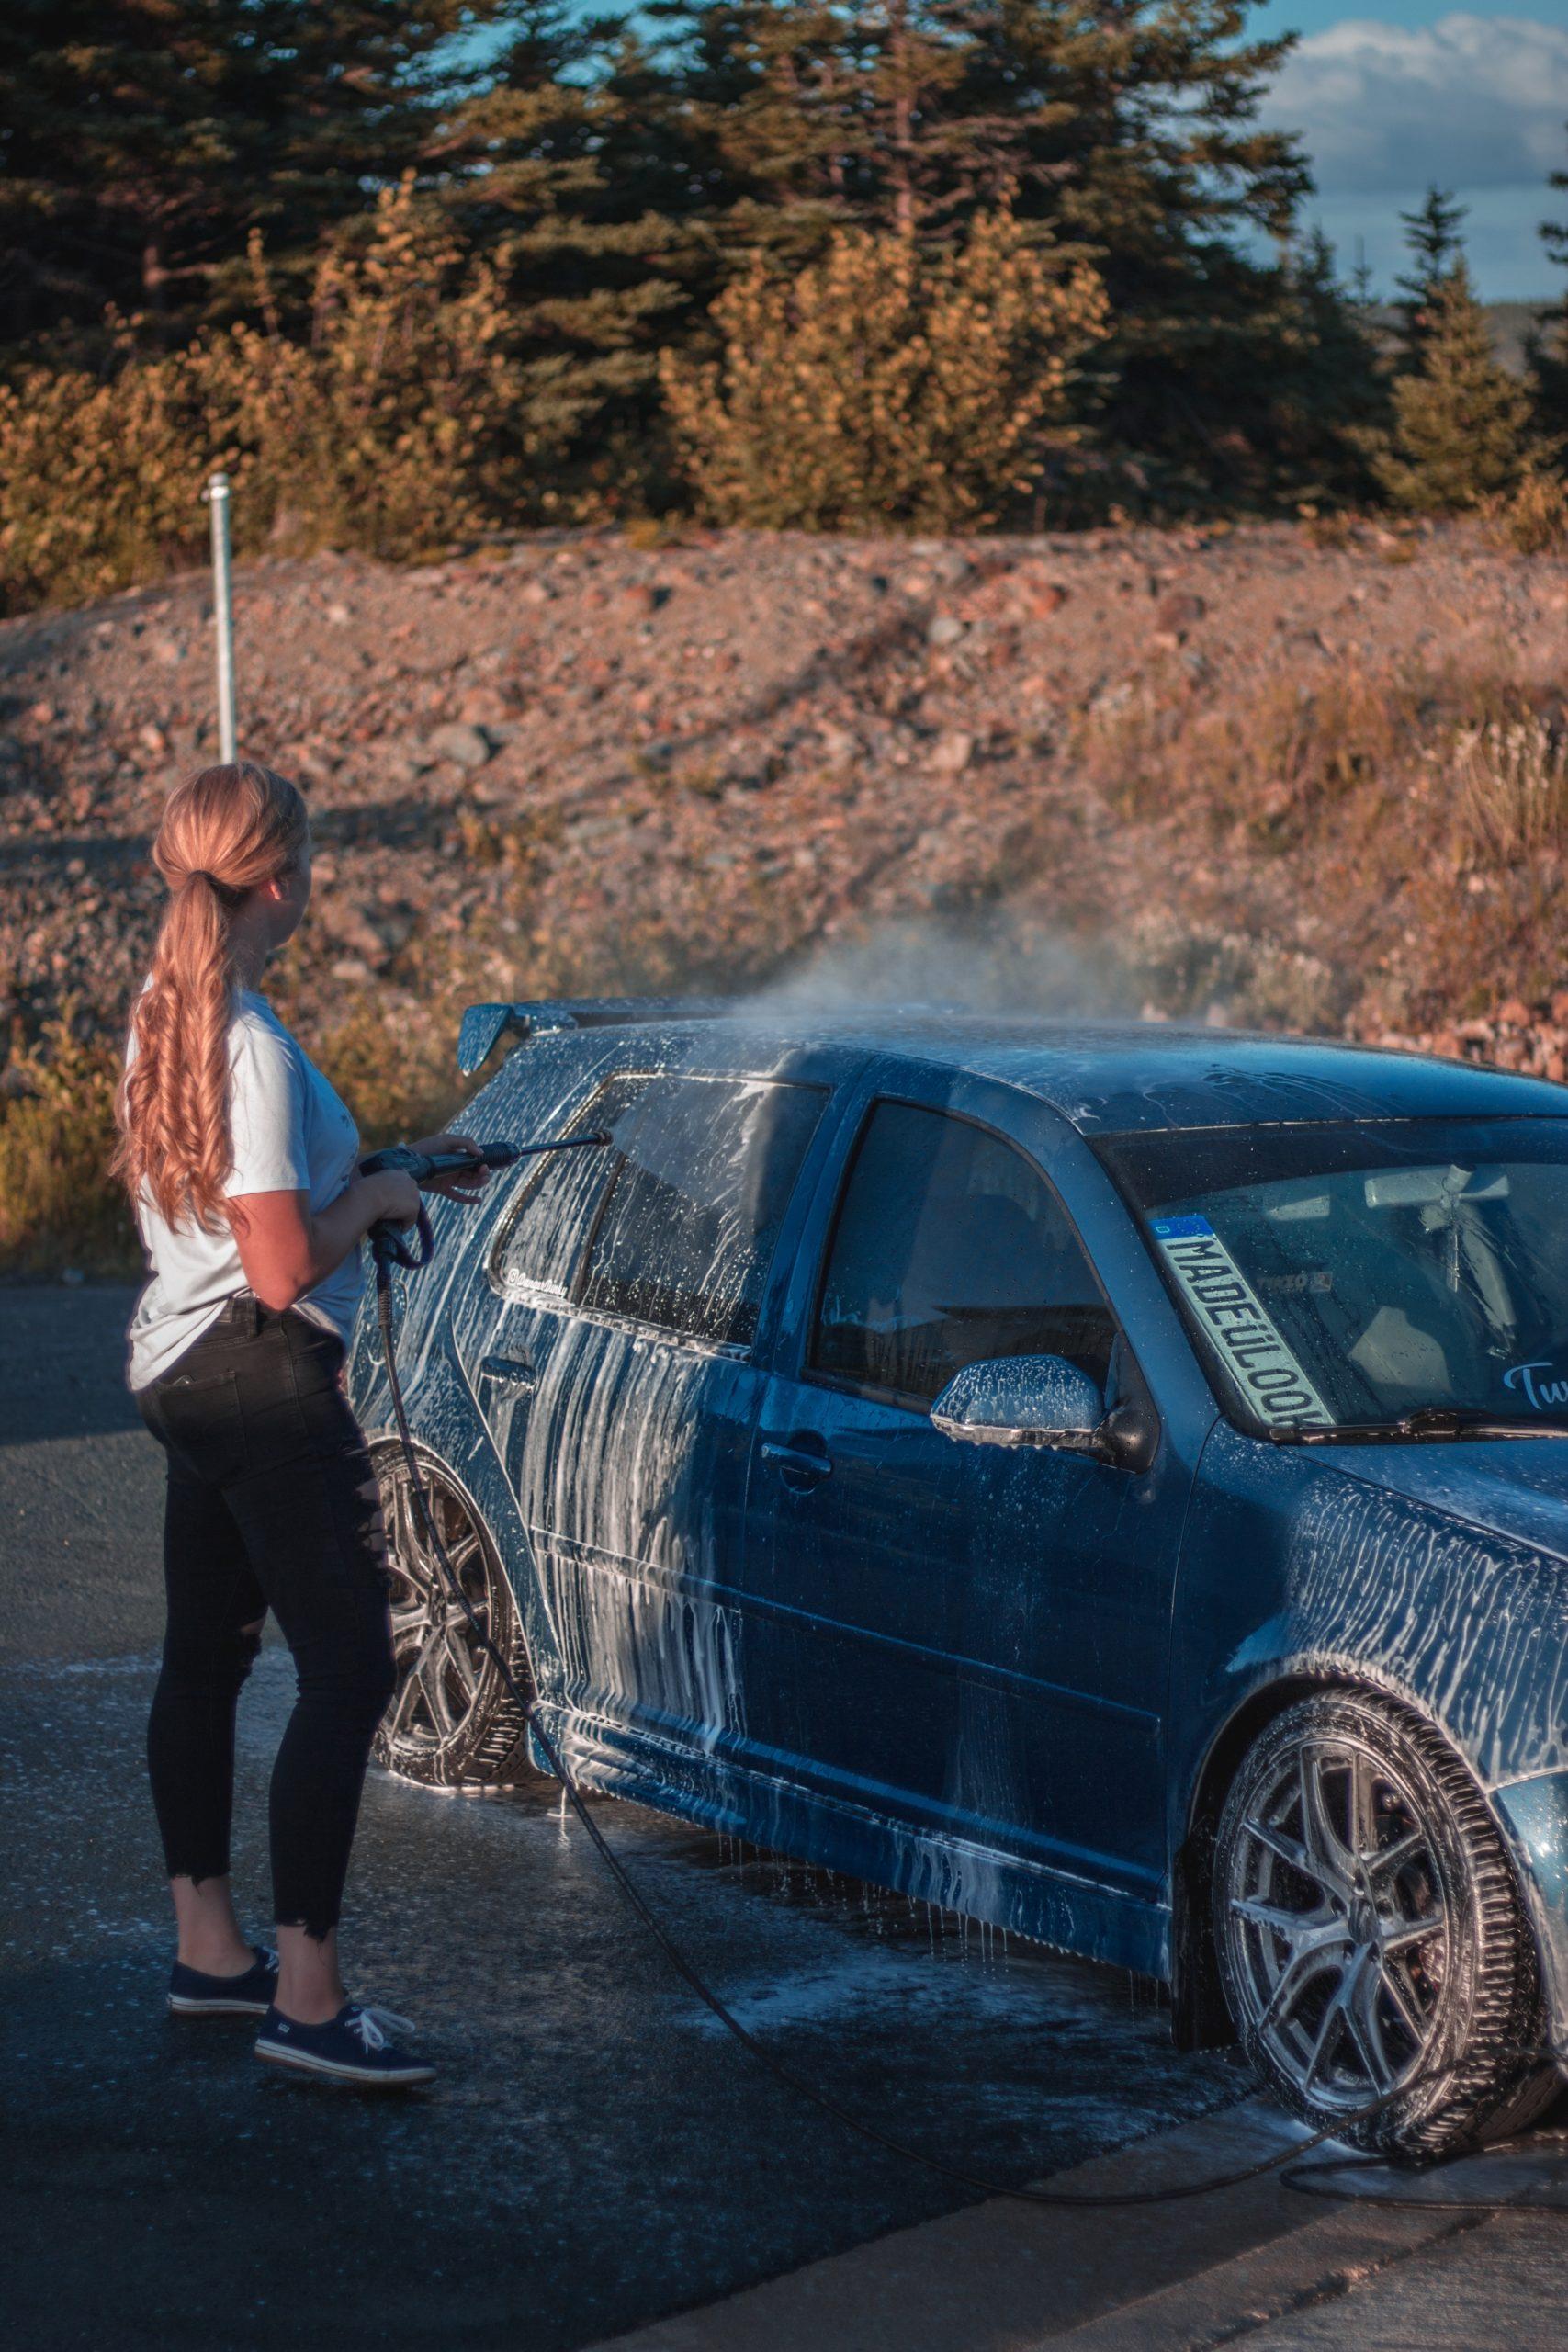 woman power washing car